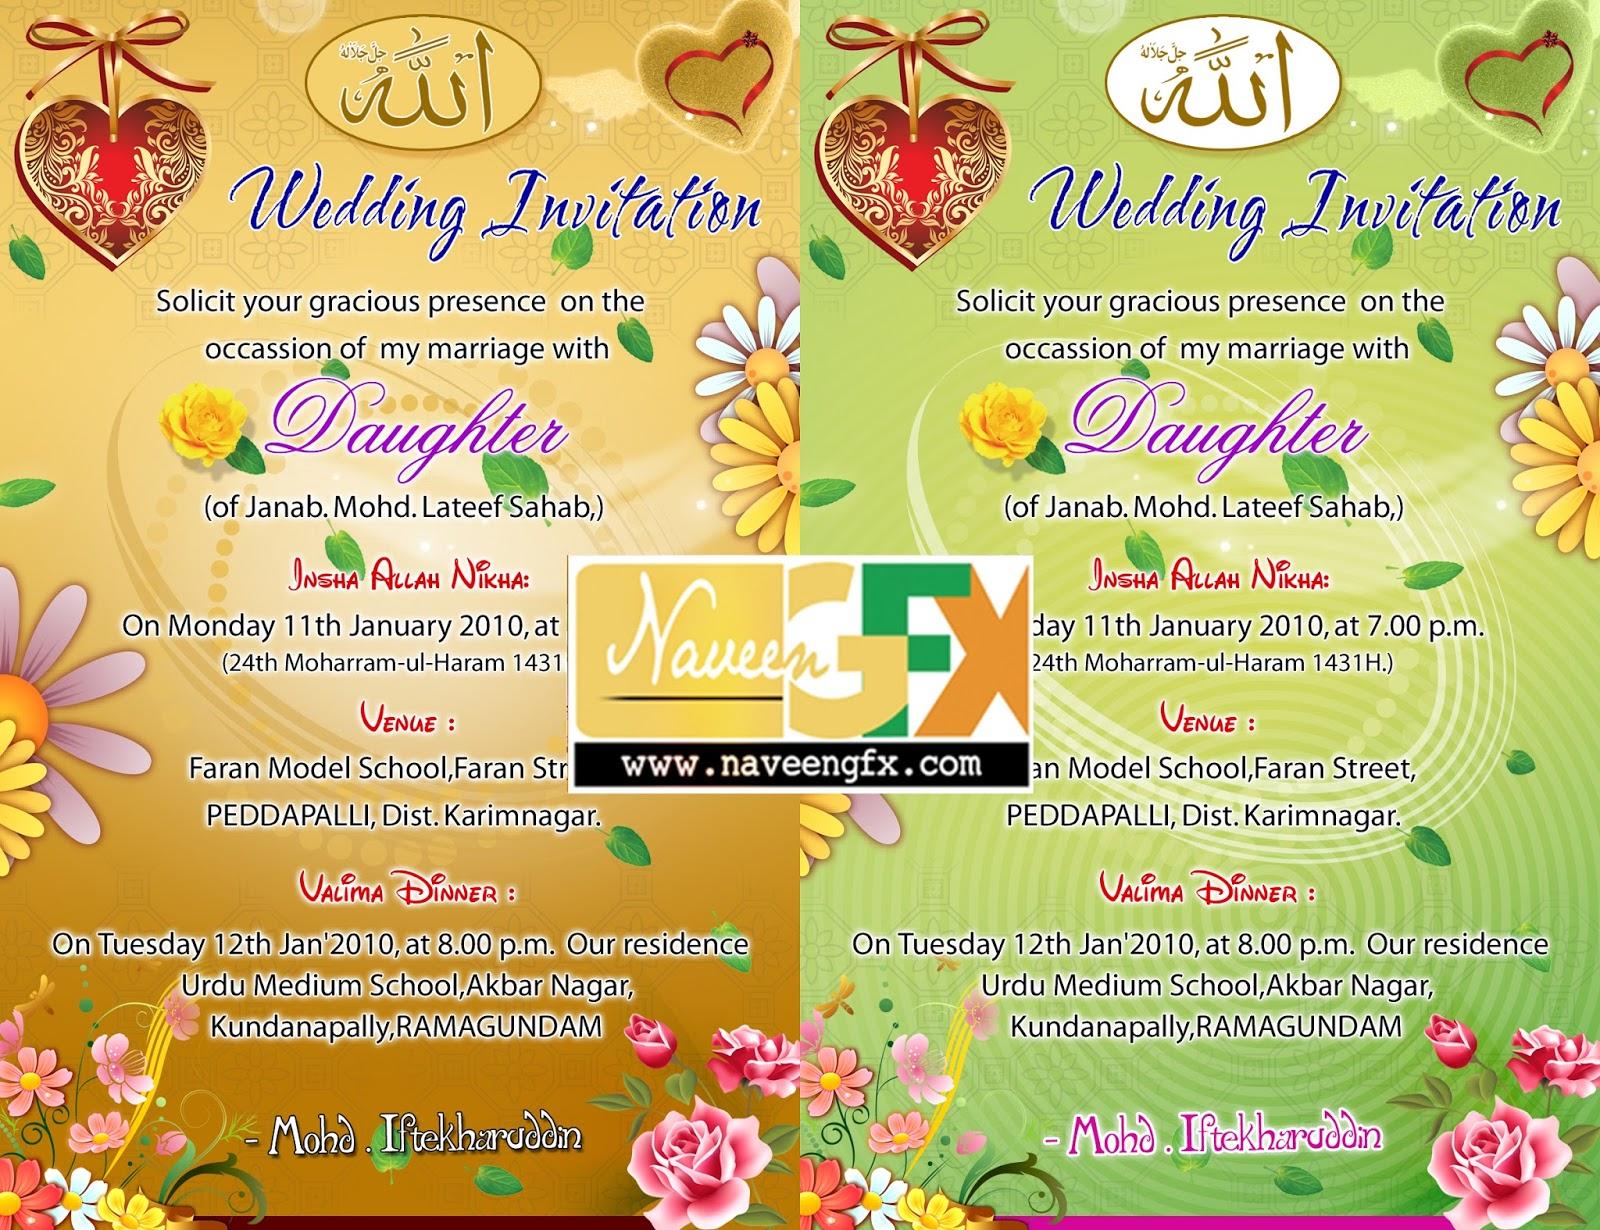 Create Indian Wedding Invitation Card Online Free – Prepare Wedding Invitation Card Online Free